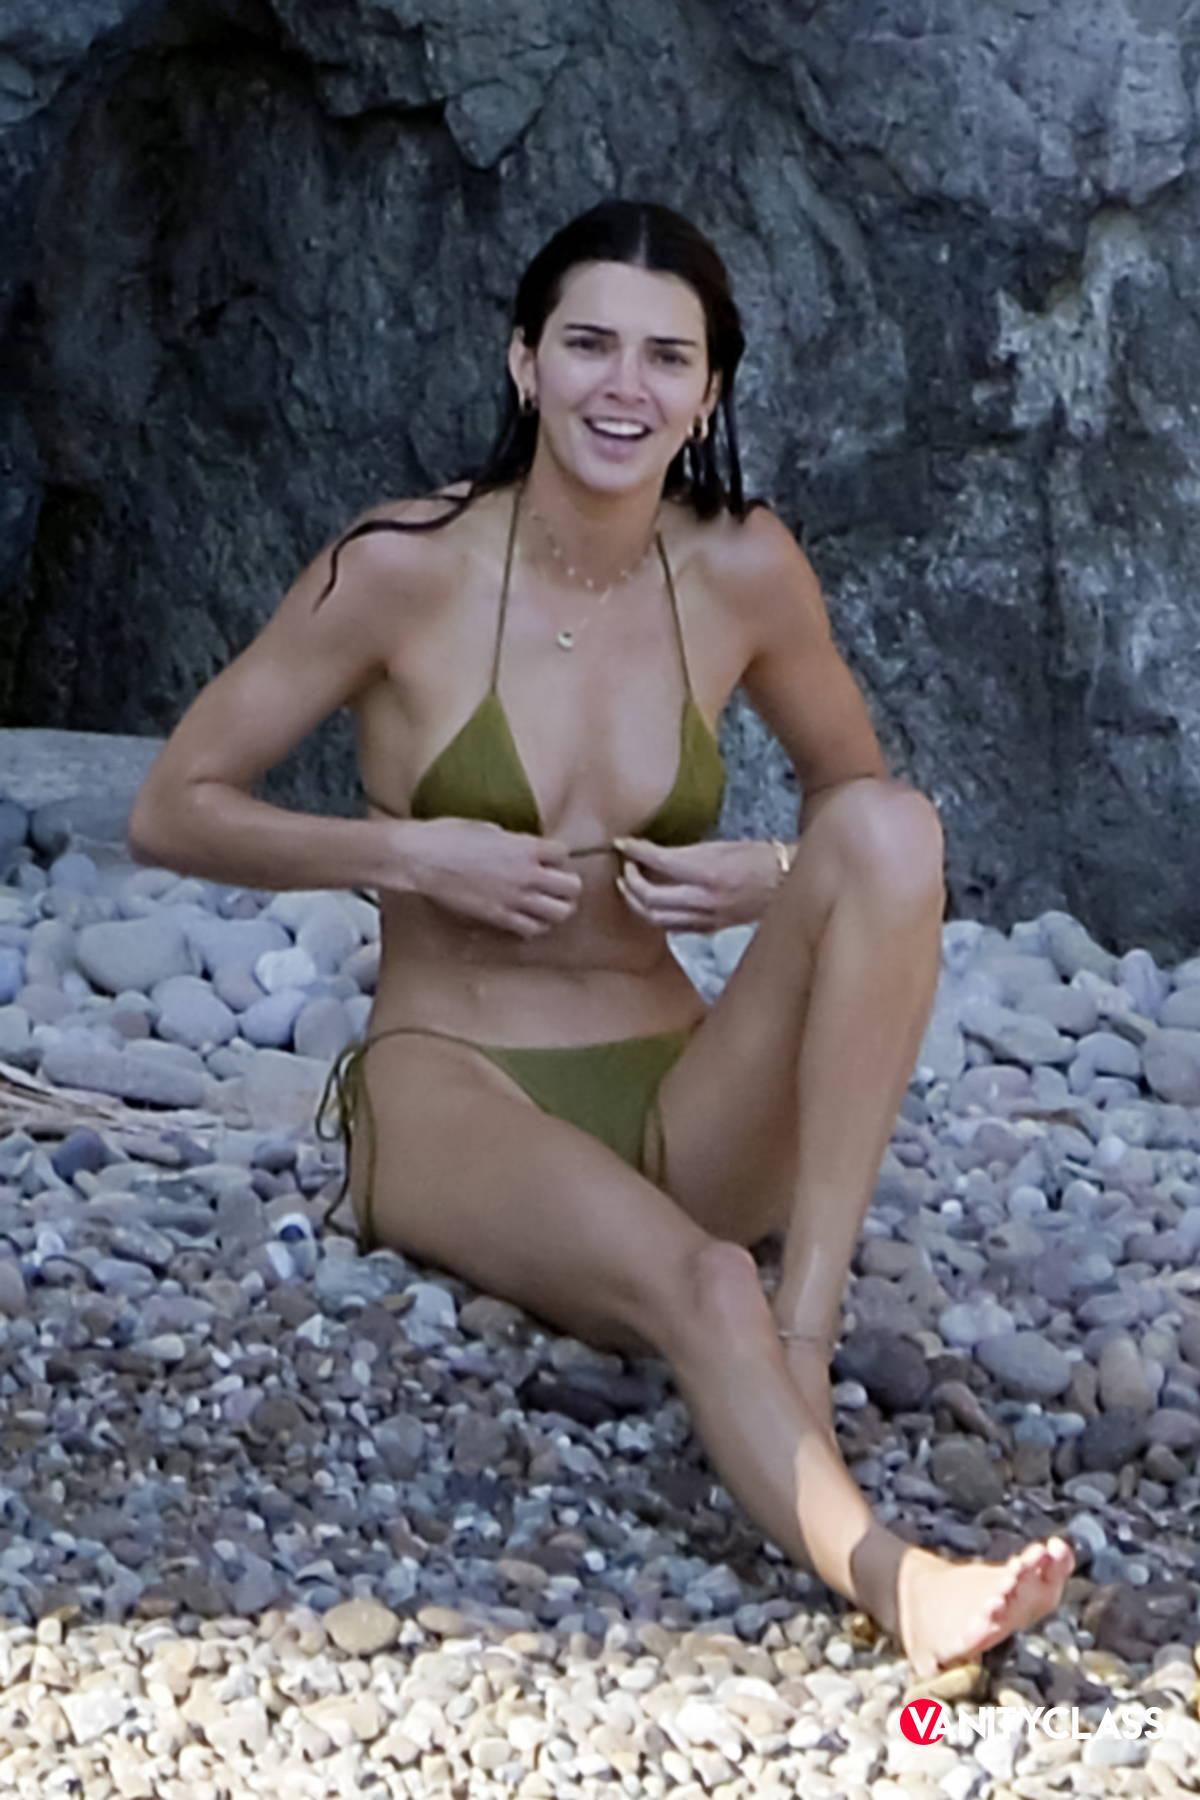 Kendall Jenner si è innamorata di Ponza